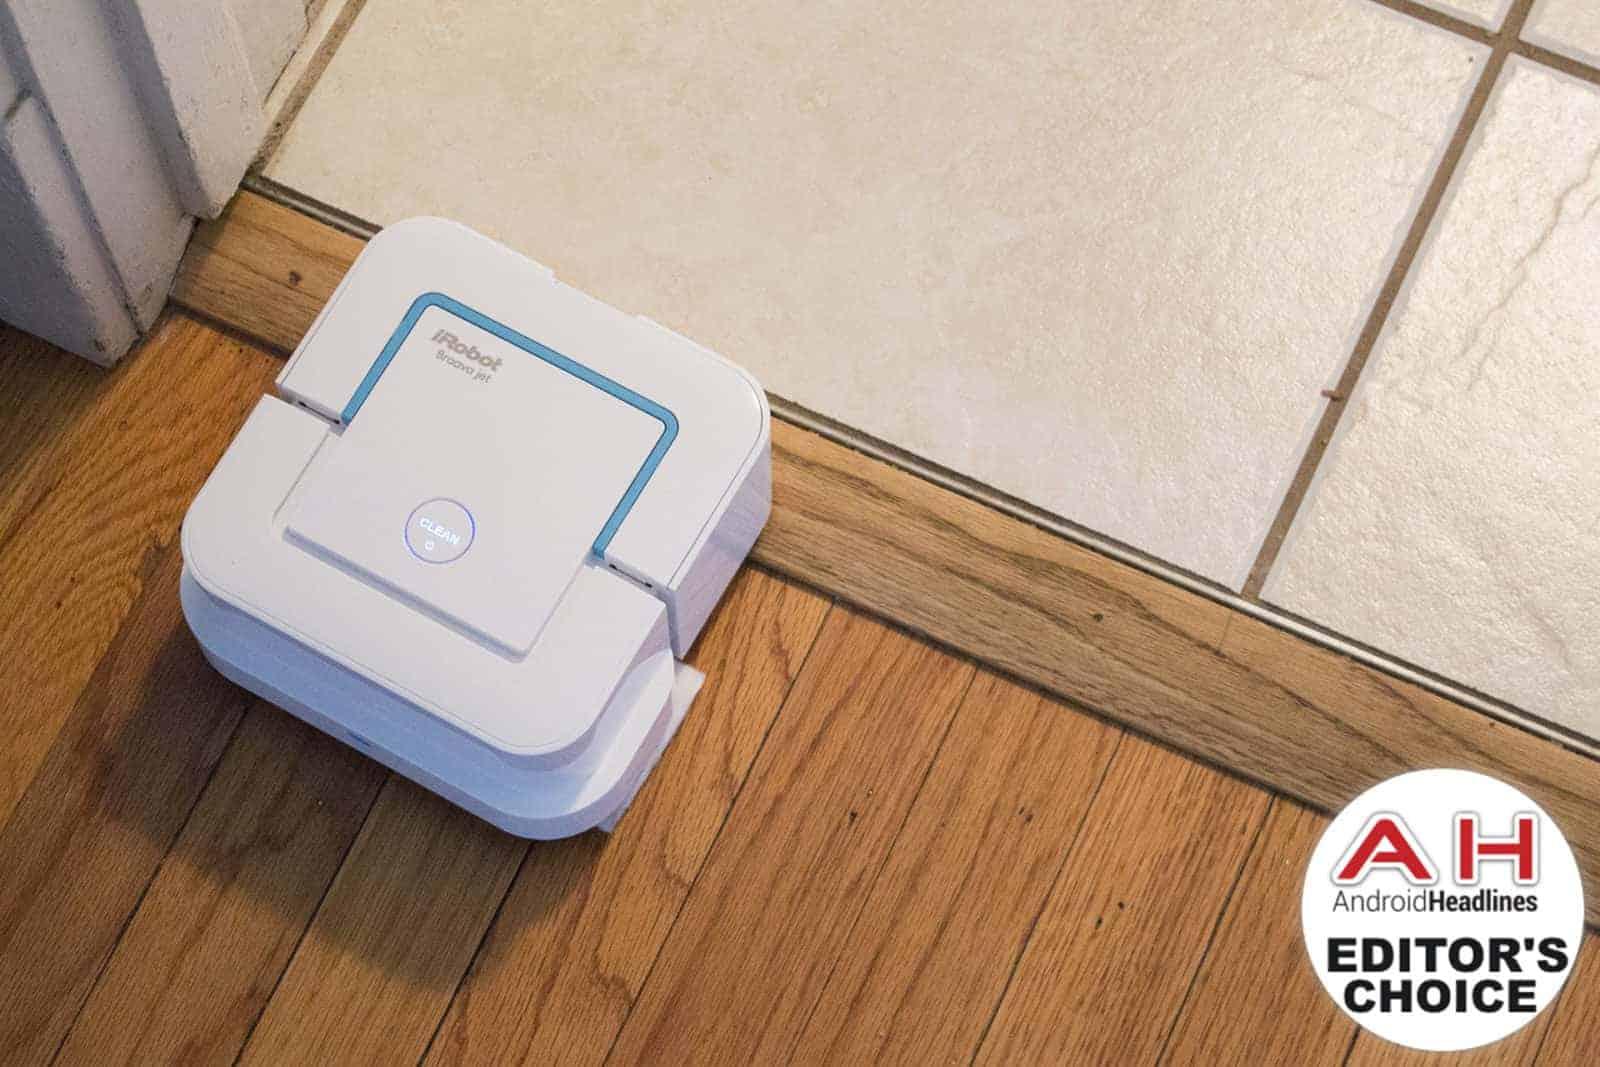 IRobot Braava Jet Robot Mop Review Android News - Roomba that mops floors